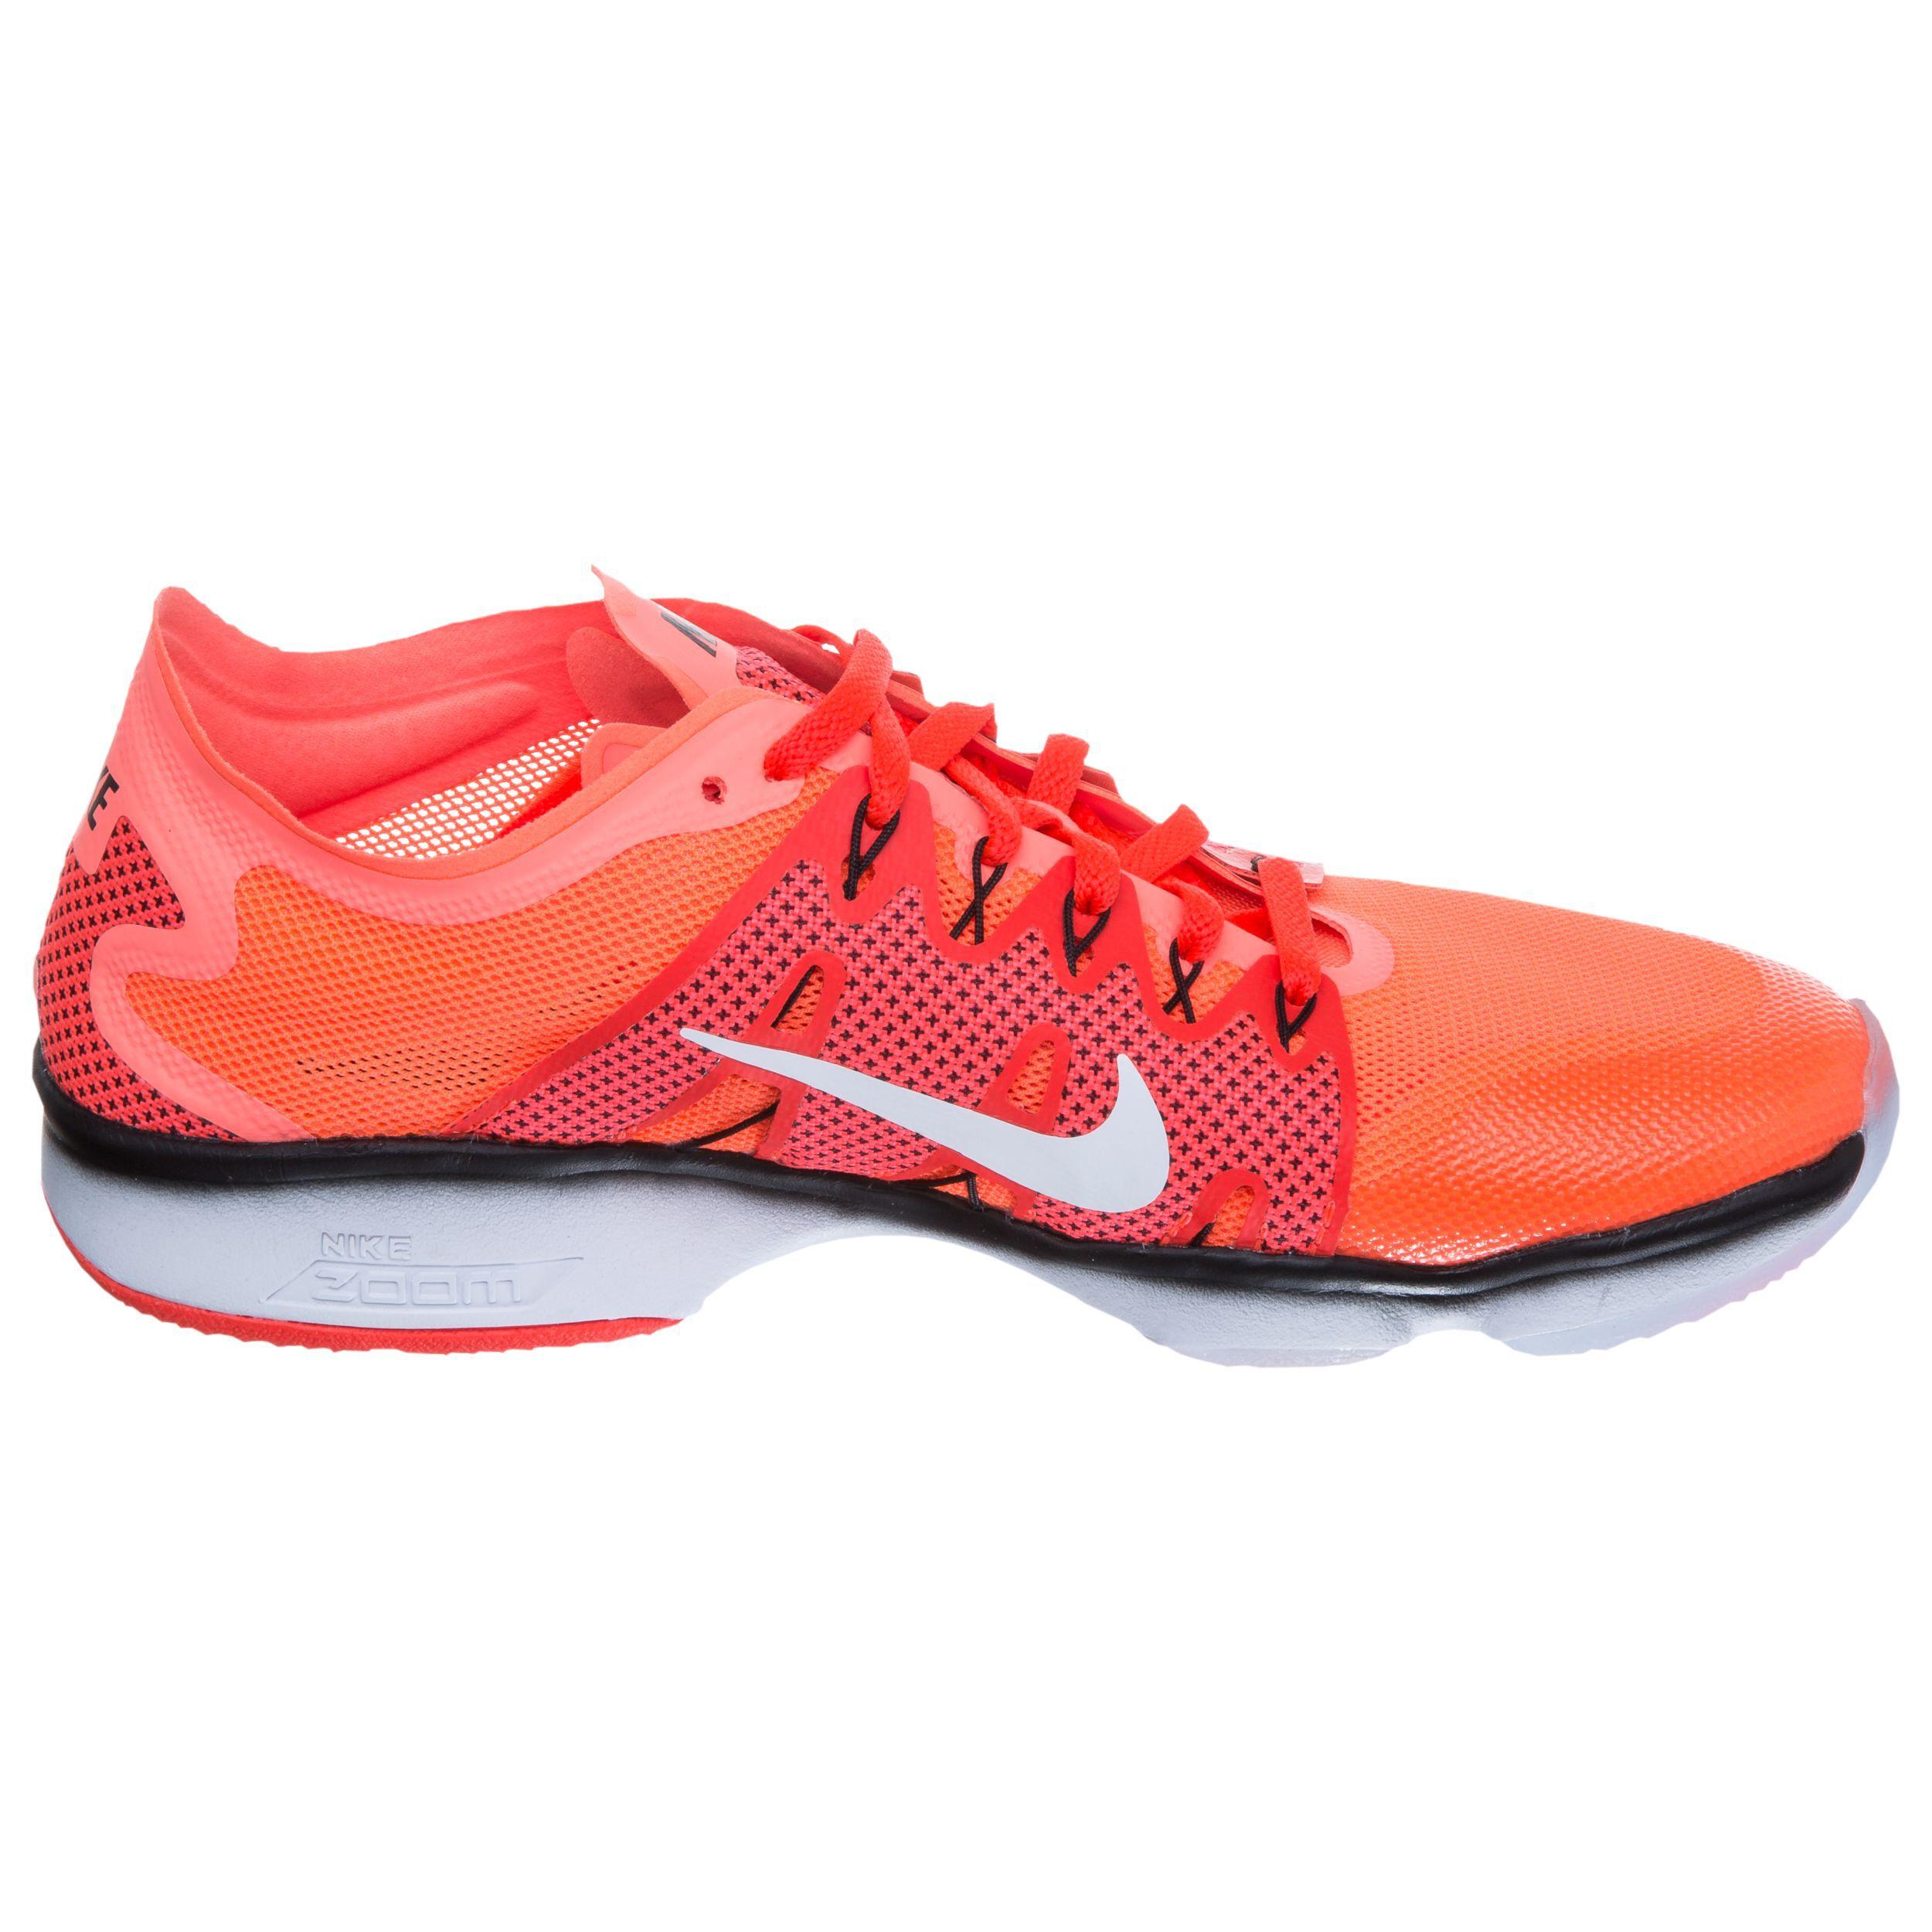 Nike Zoom Fit Agility 2 Fitnessschuh Damen Orange, Weiß